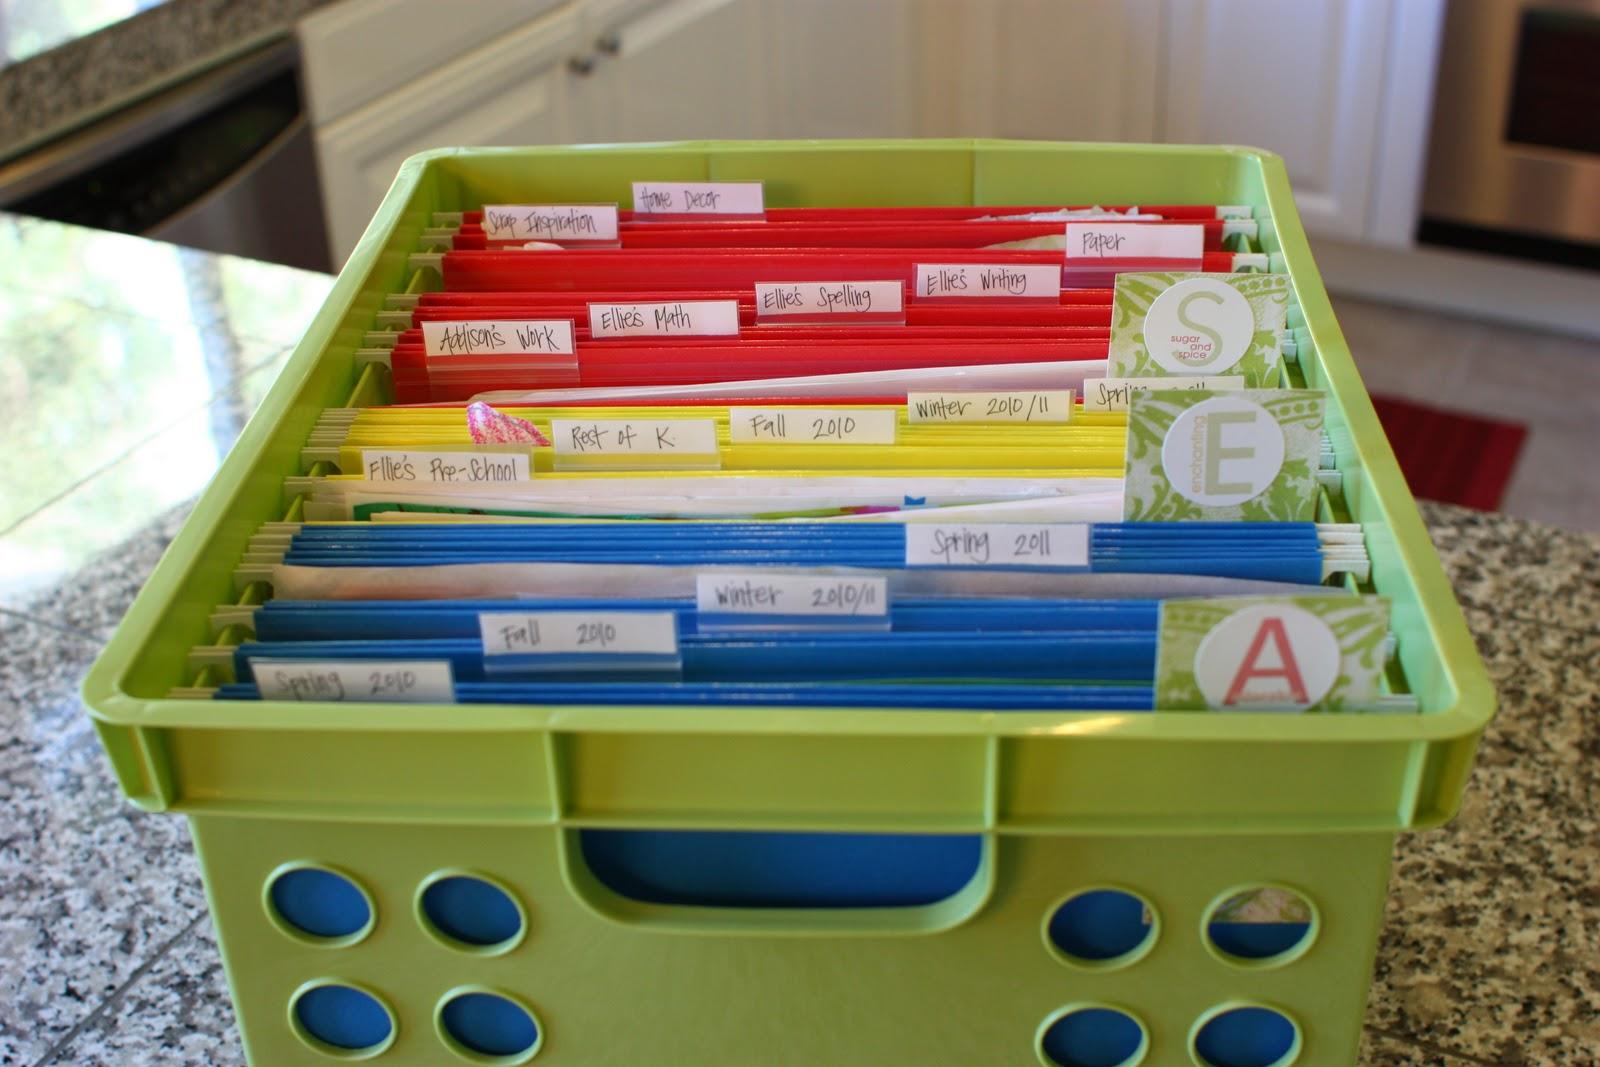 Scrapbook ideas school project - Project Life Organization